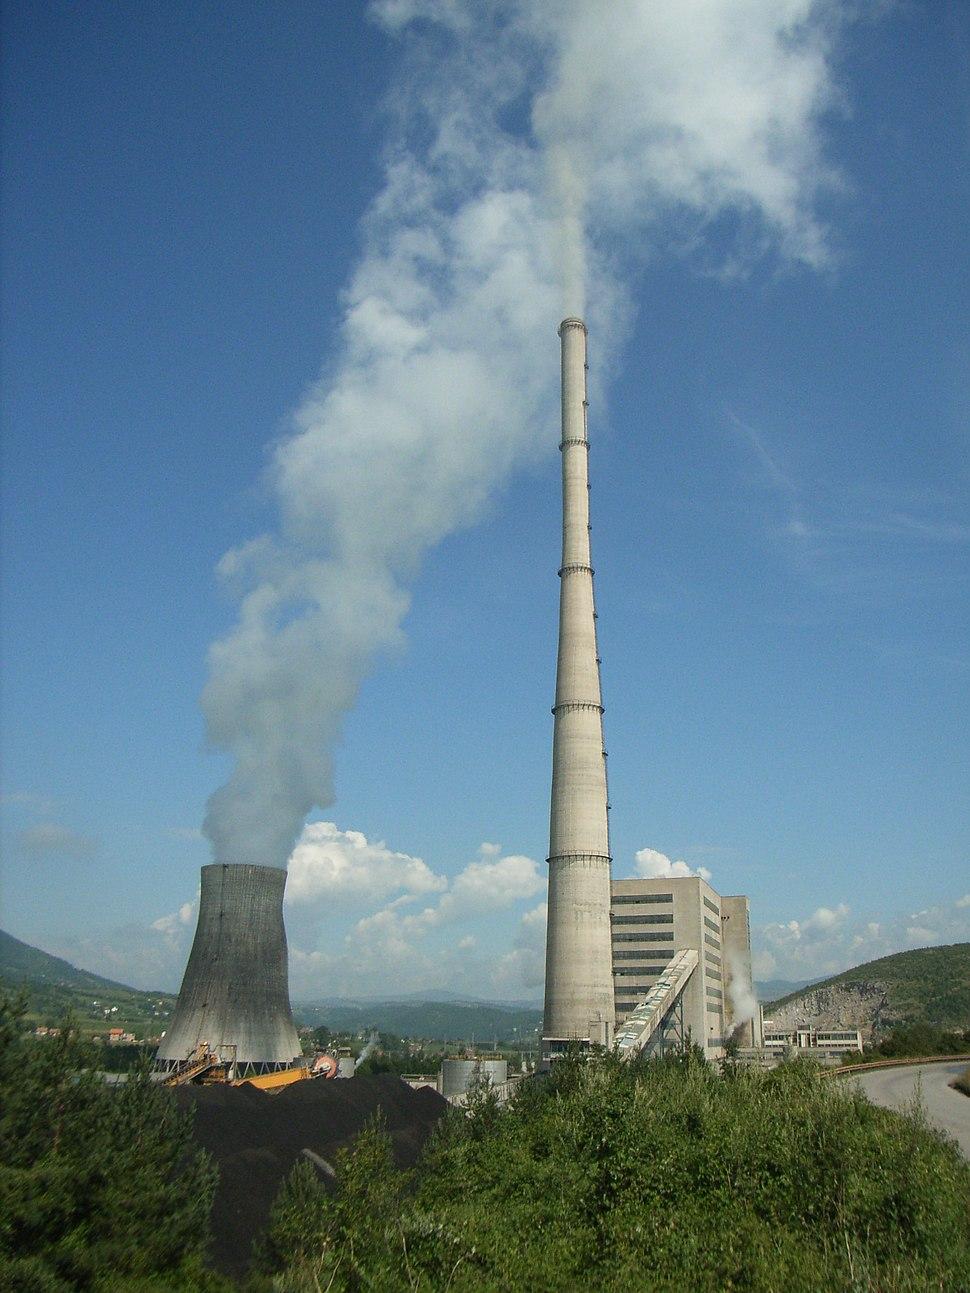 Pljevlja Power station